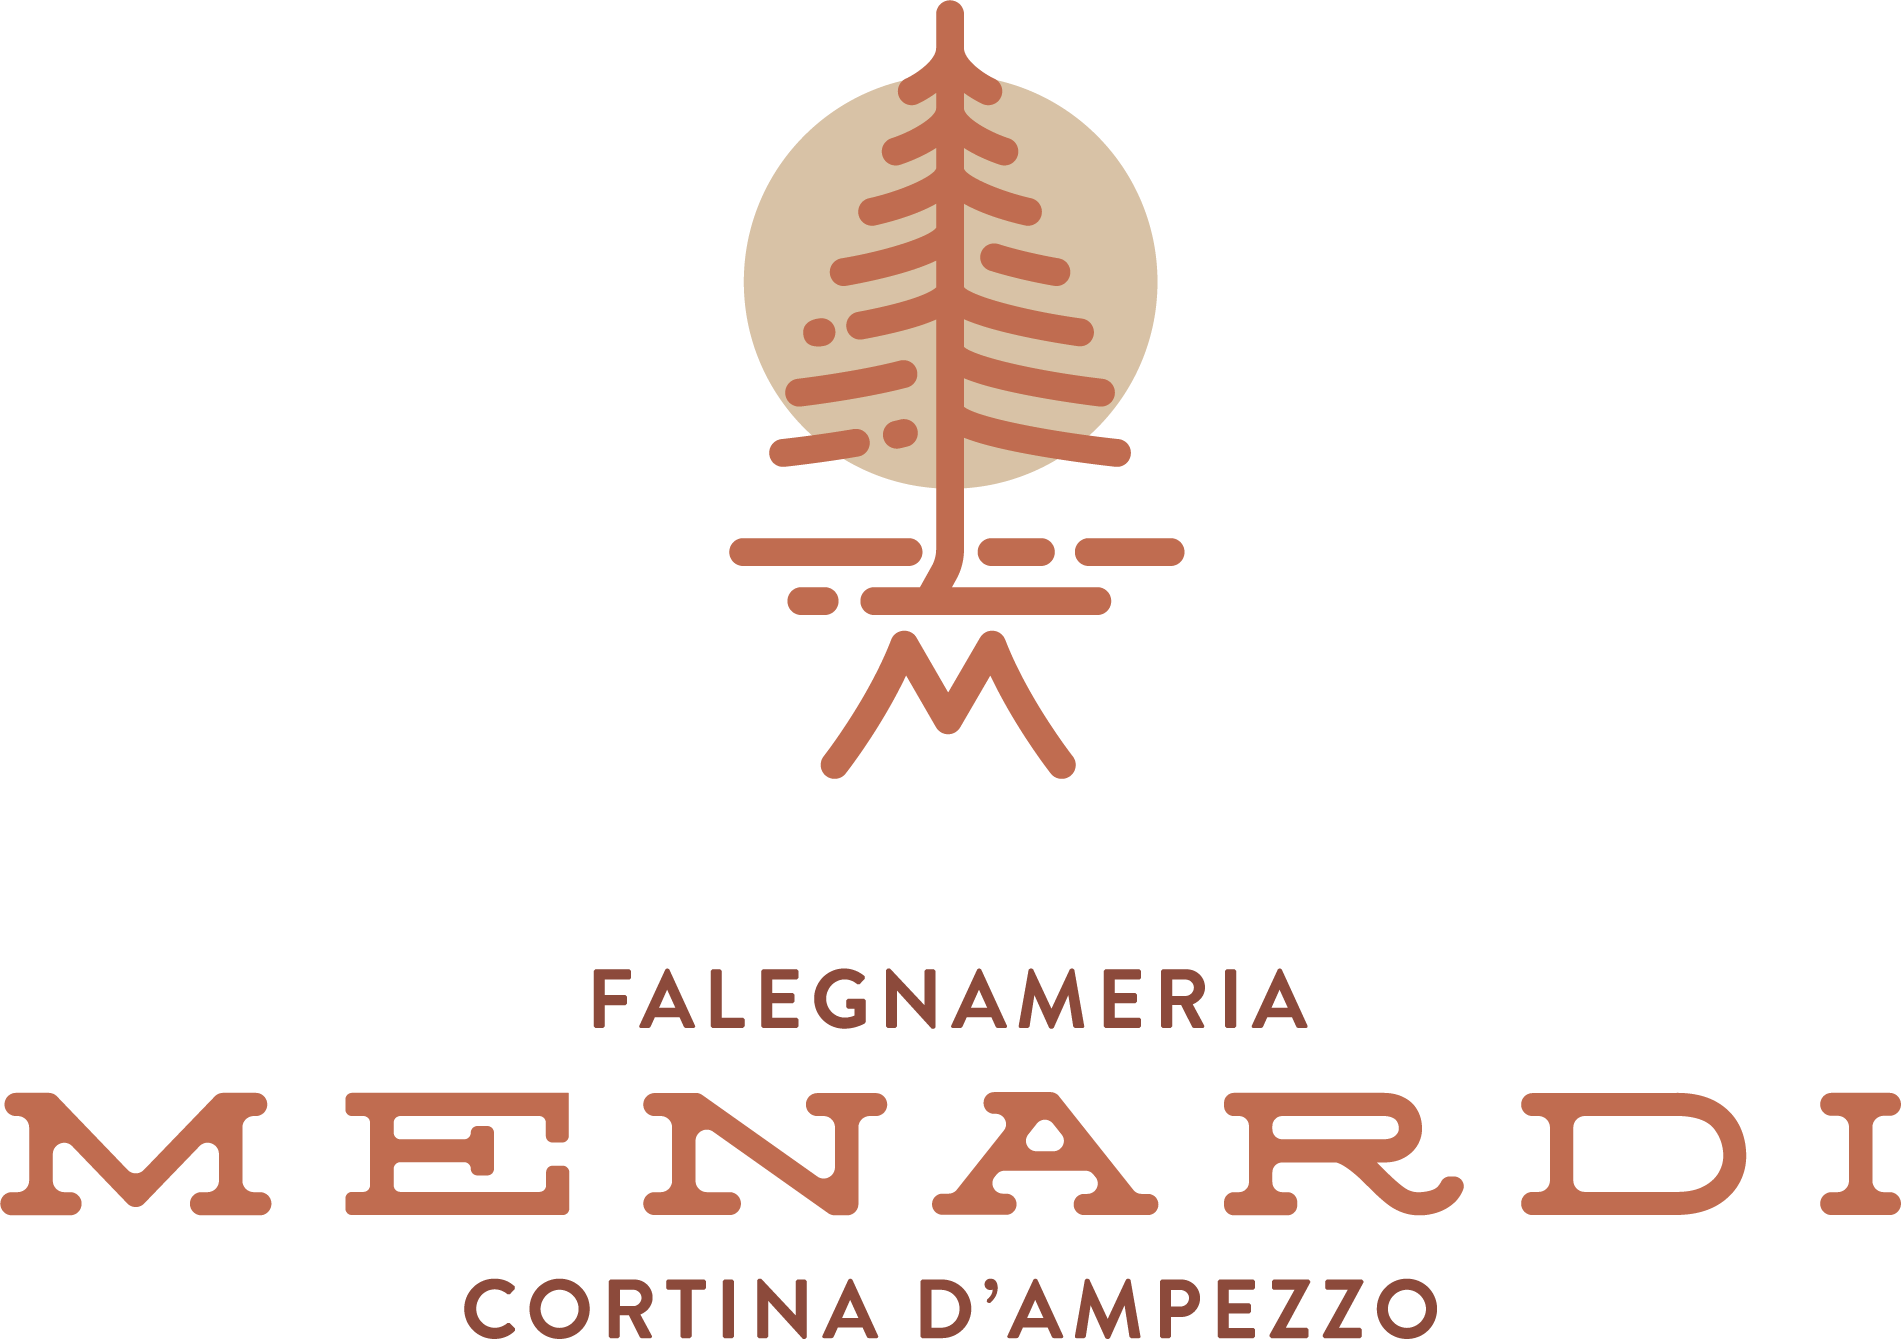 Falegnameria Menardi Logo